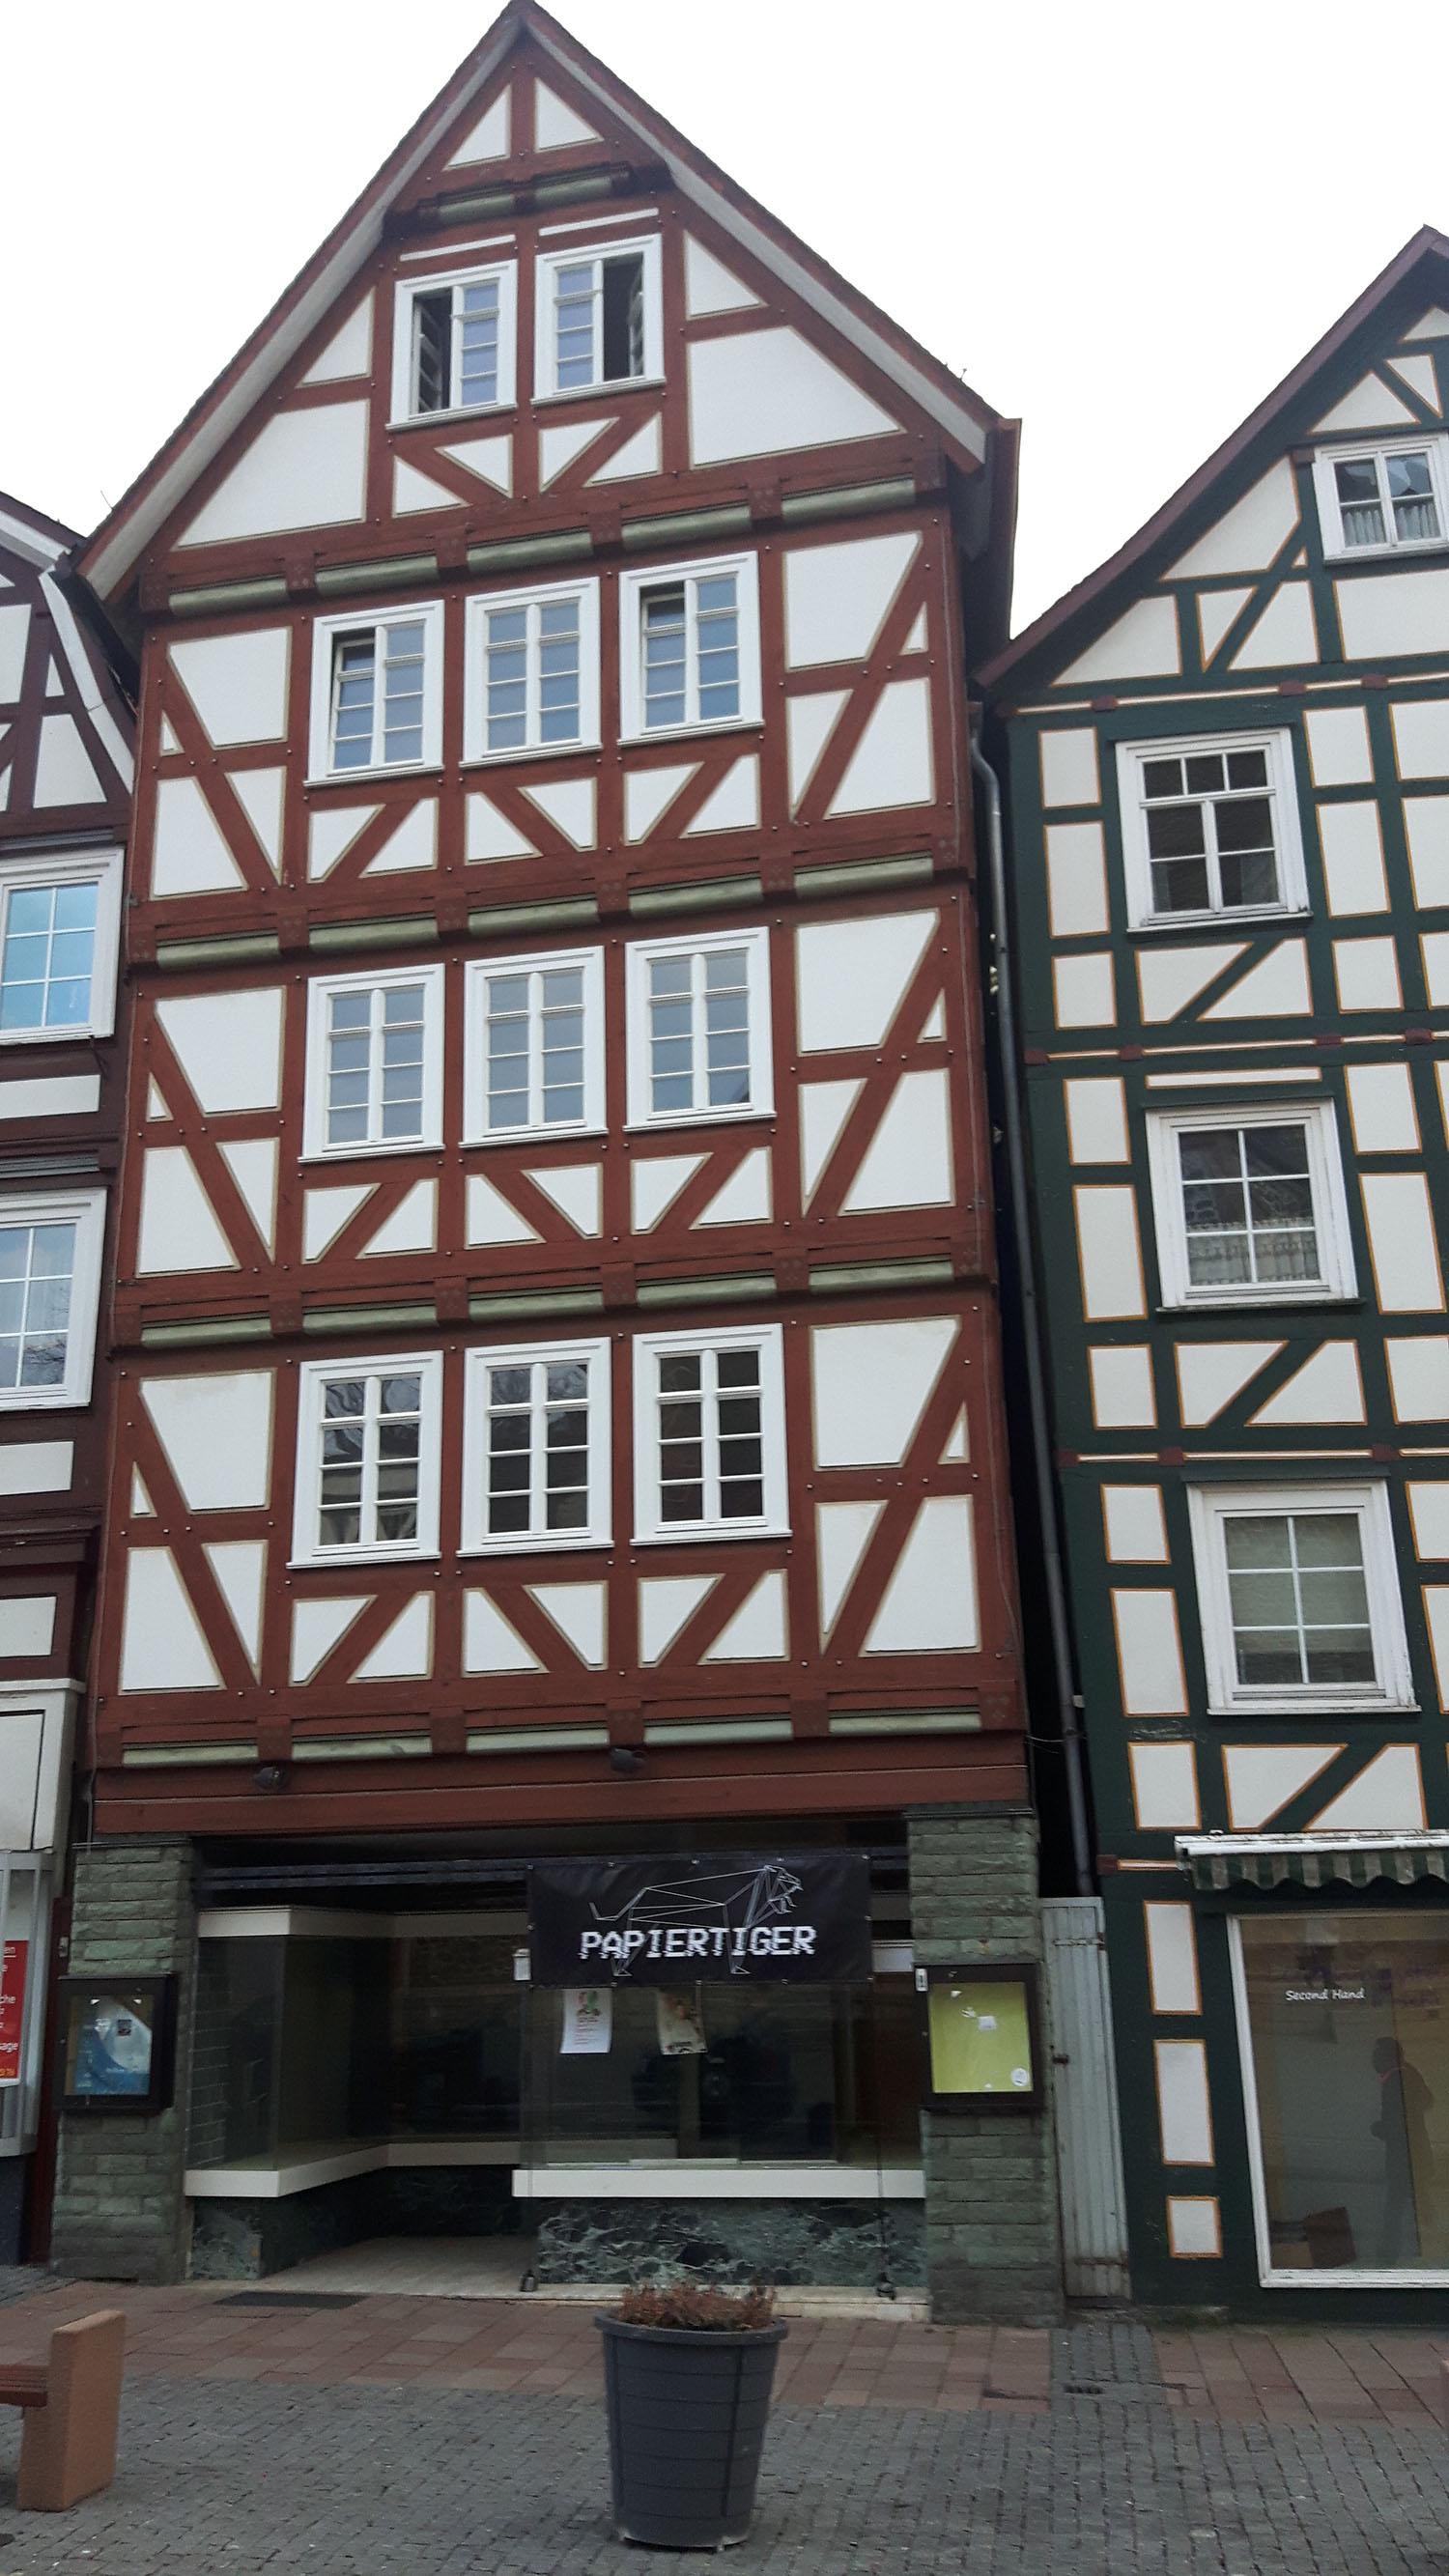 Homberg Efze Marktplatz - Atelier Papiertiger